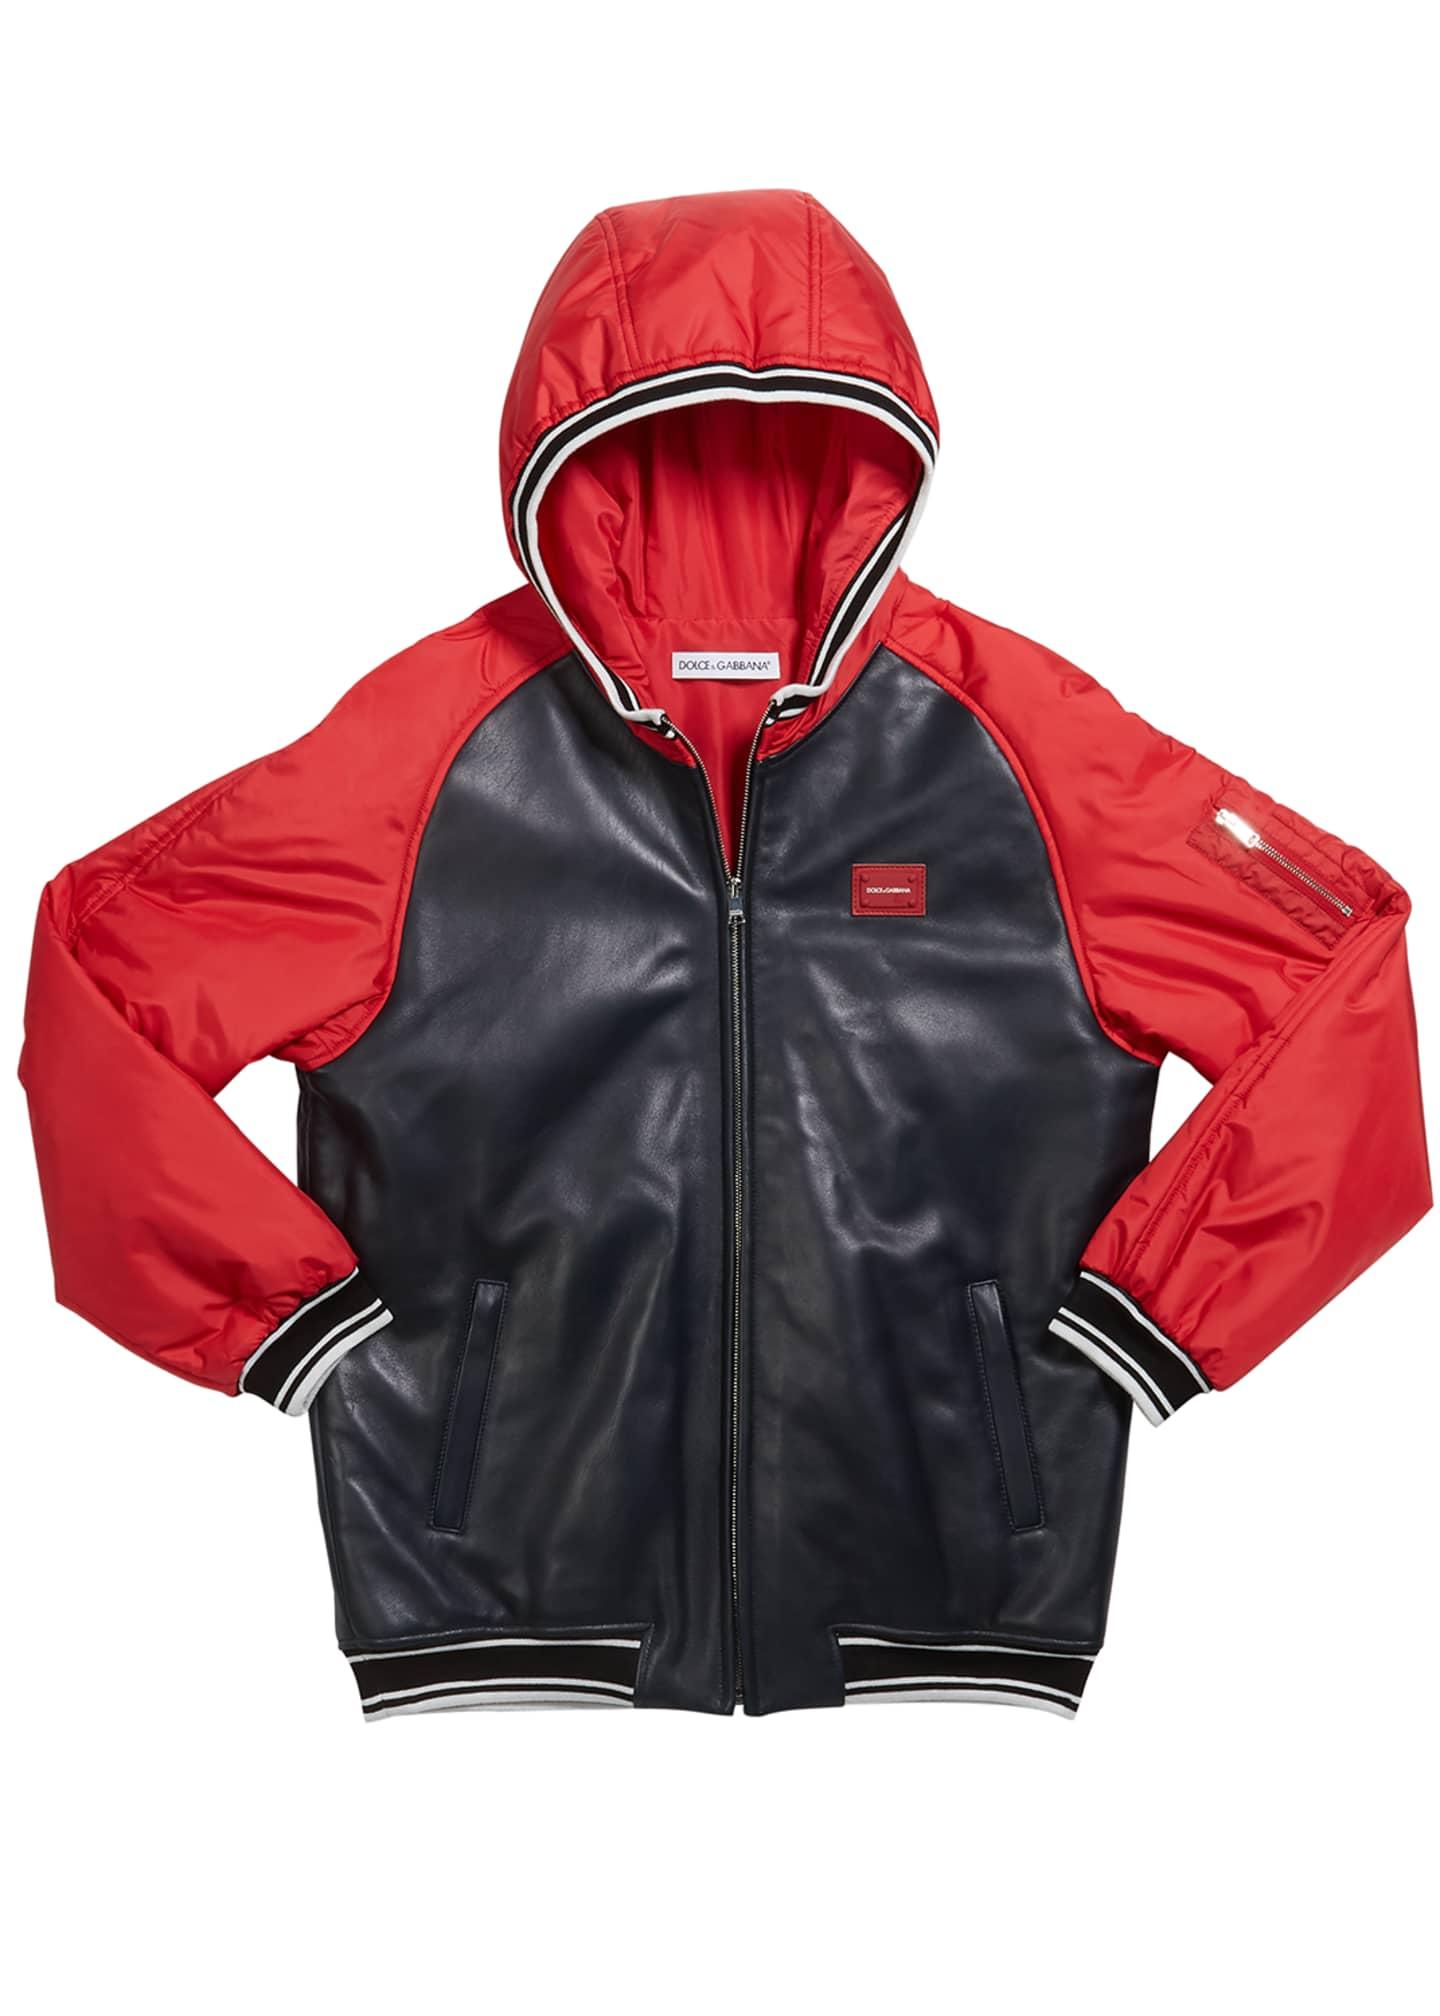 Dolce & Gabbana Boy's Leather Baseball Jacket, Size